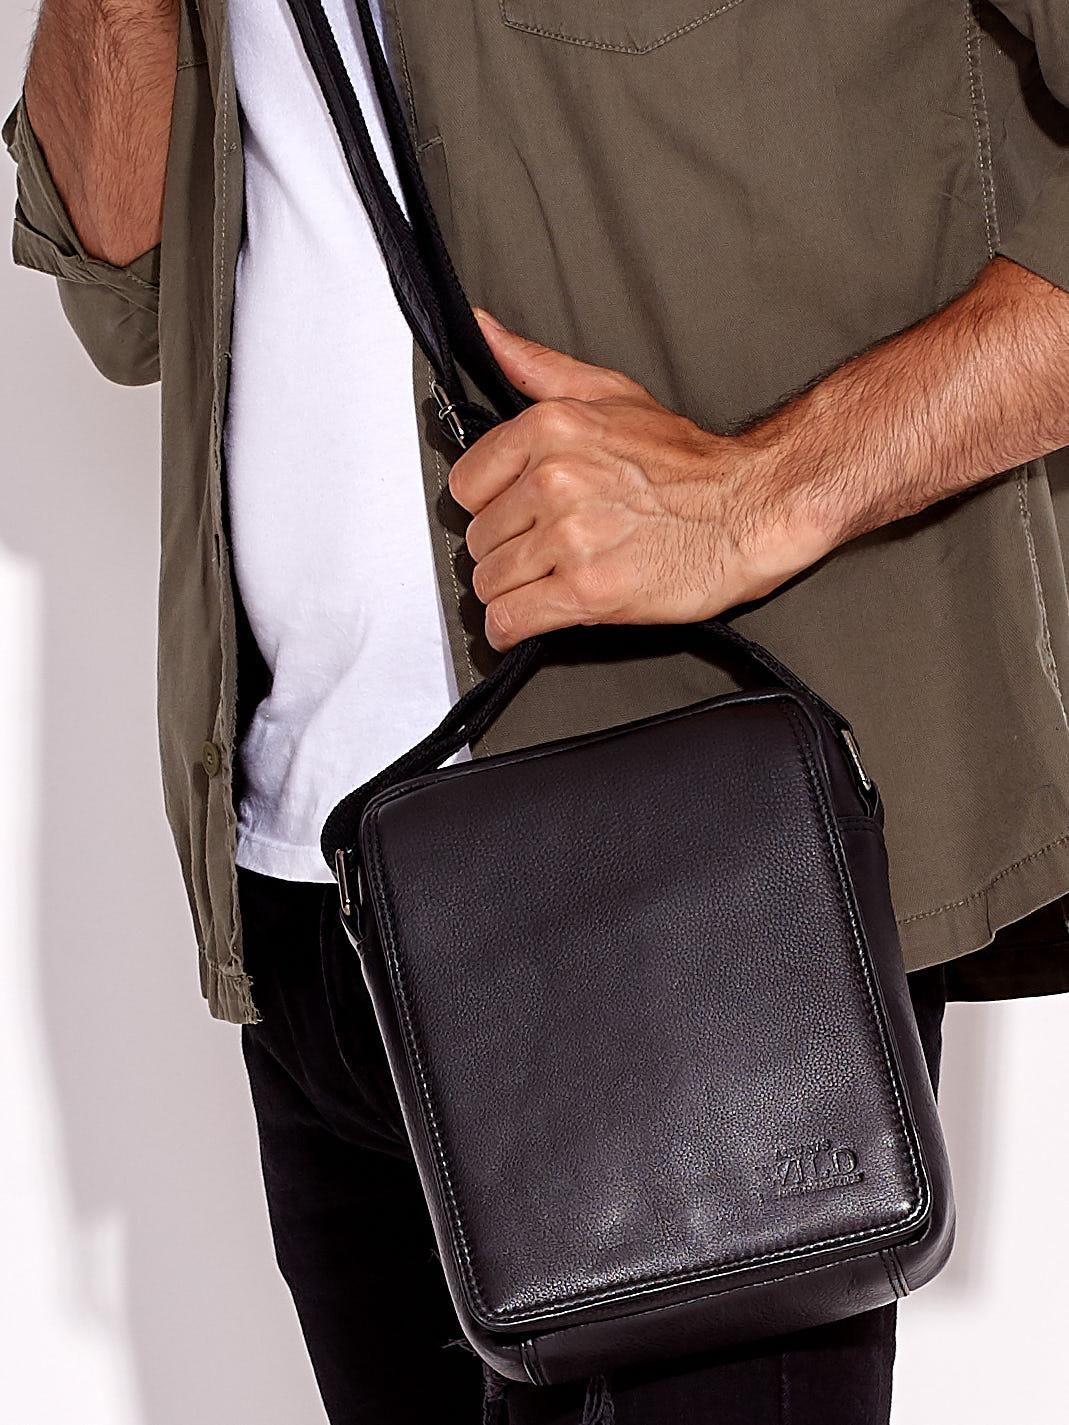 fd0aa577686e2 Czarna torba męska skórzana z klapką - Mężczyźni Torba męska - sklep ...